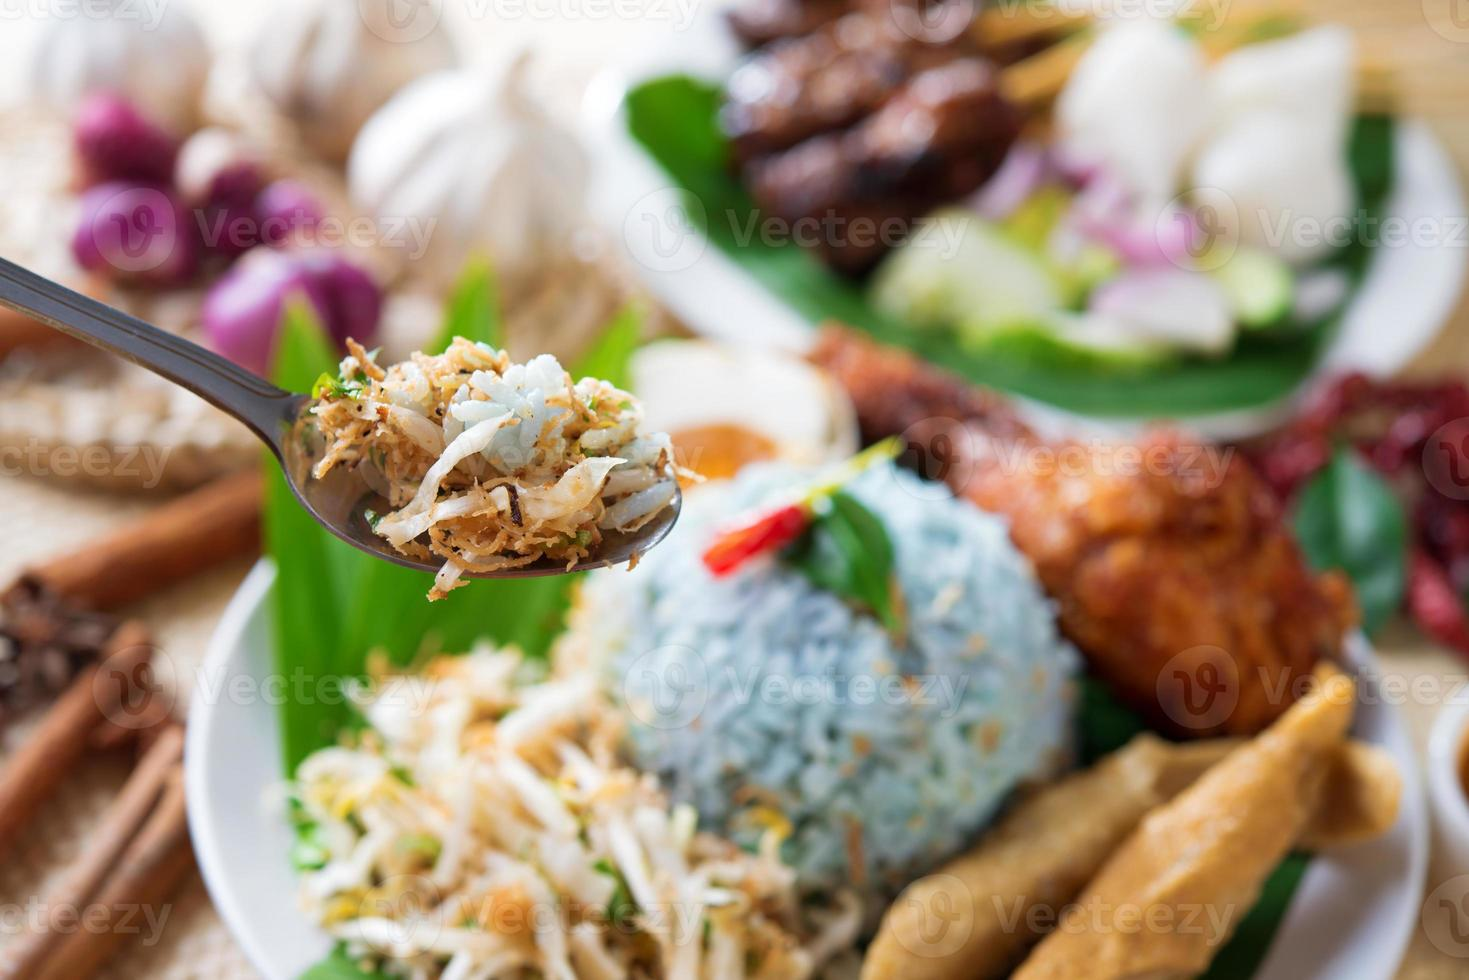 malaisie nourriture photo